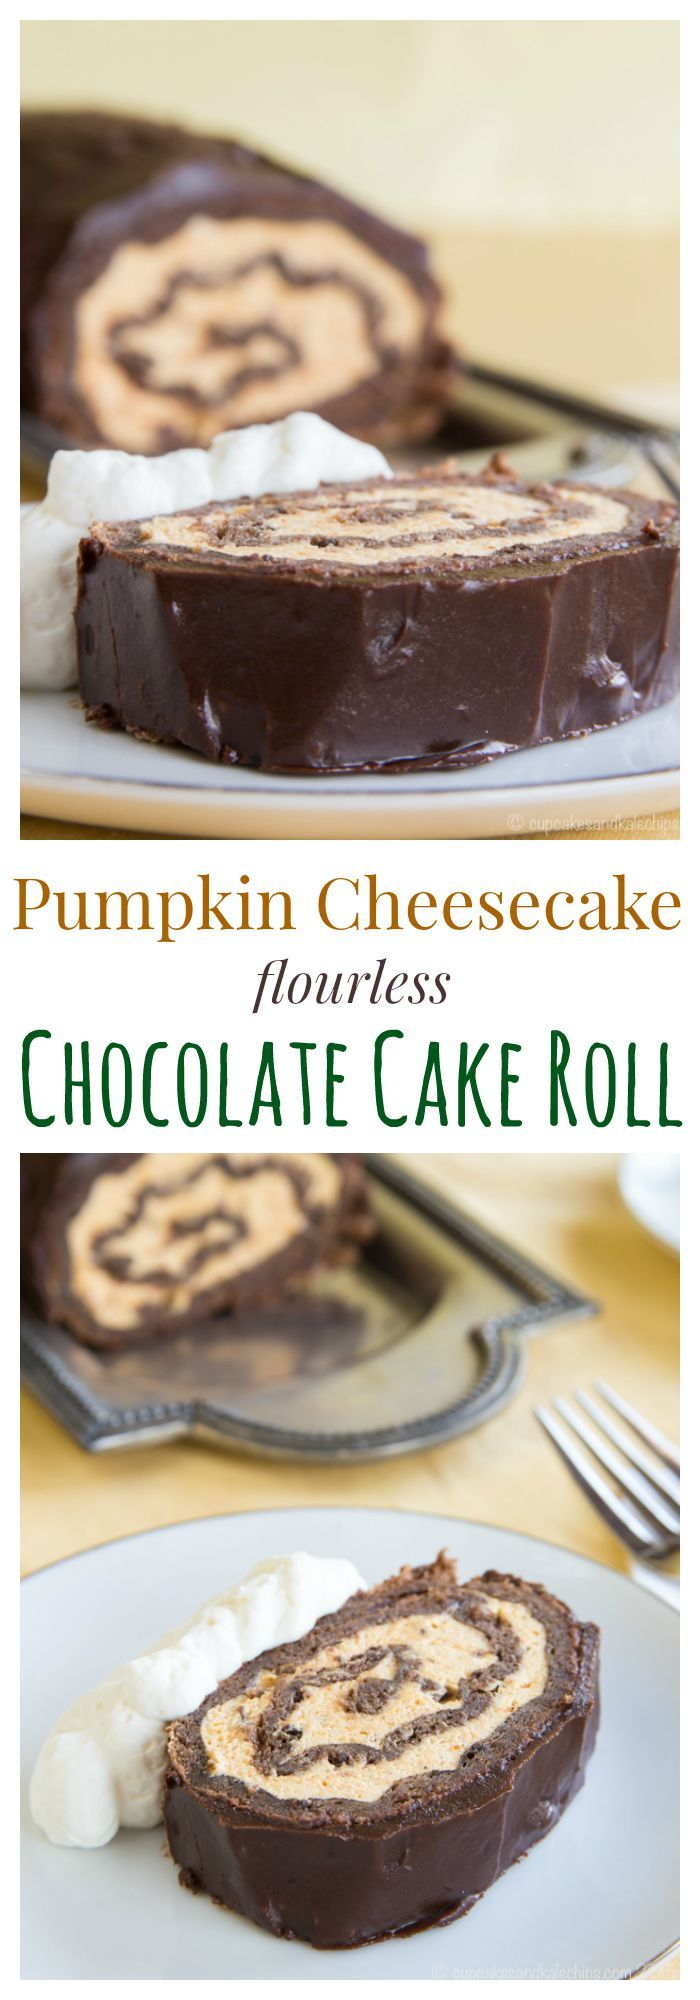 Pumpkin Cheesecake Flourless Chocolate Cake Roll - an impressive dessert for fall with pumpkin cheesecake mousse, chocolate sponge cake, and rich chocolate ganache. #PumpkinWeek | cupcakesandkalechips.com | gluten free recipe